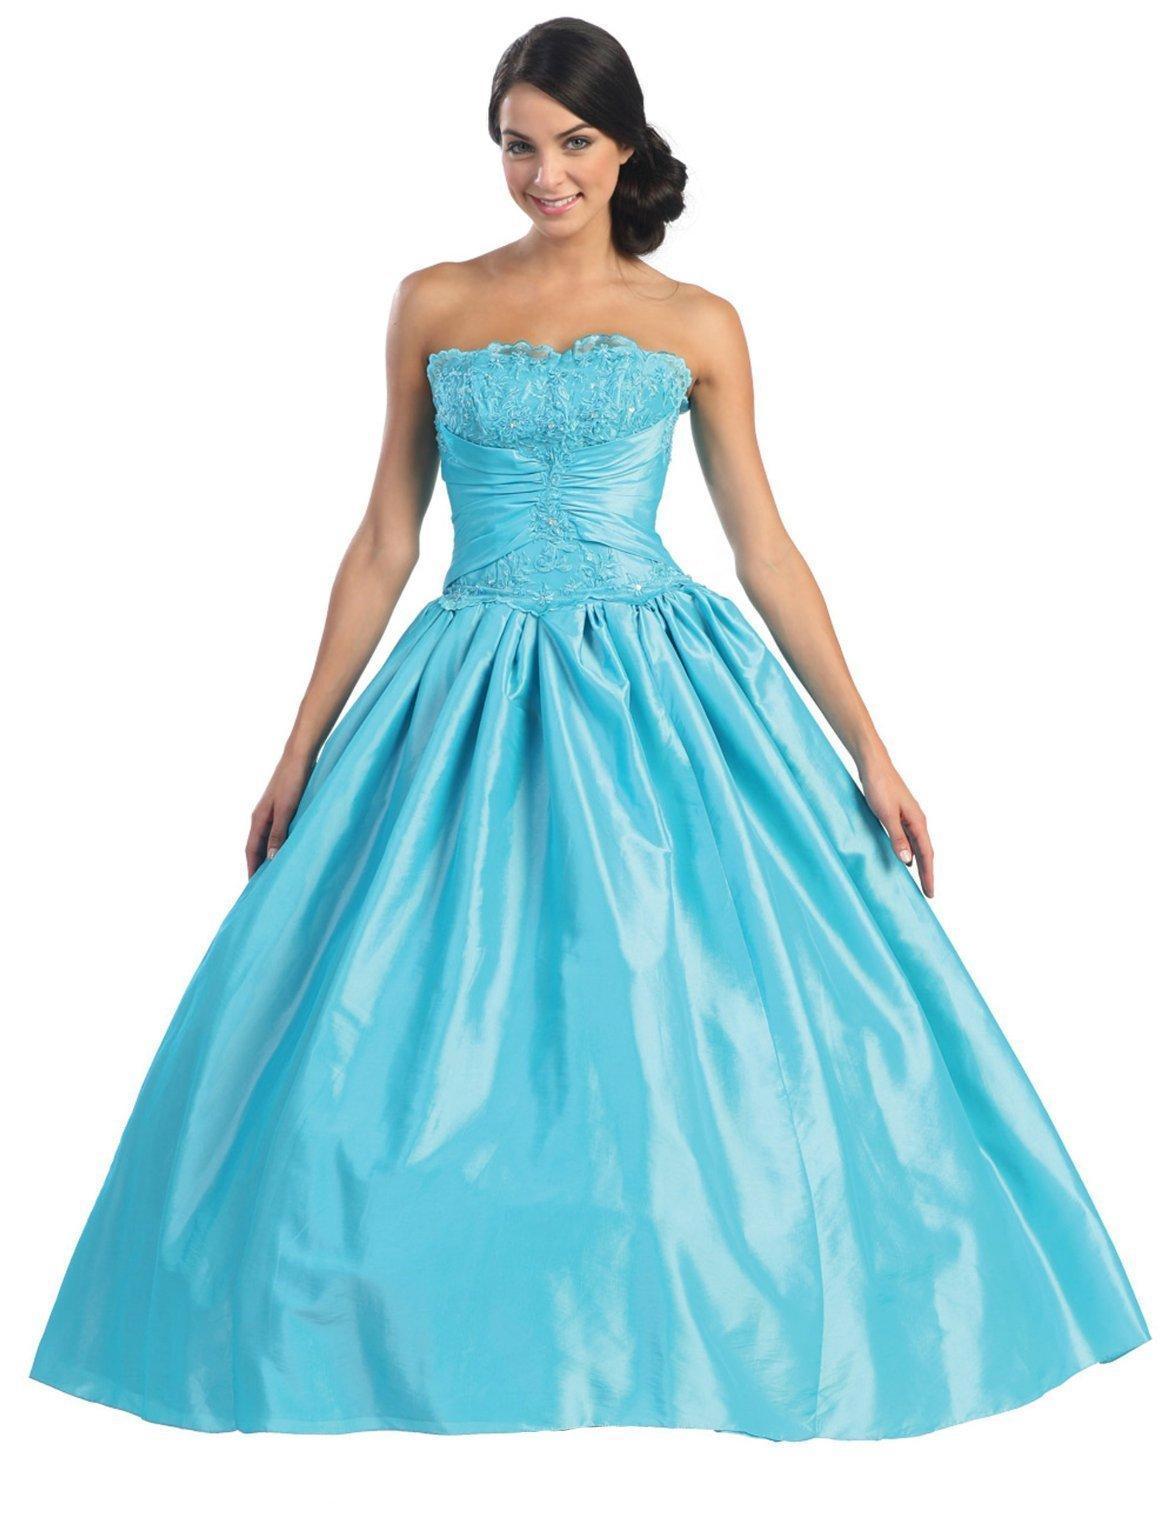 elegant turquoise dresses photo - 1